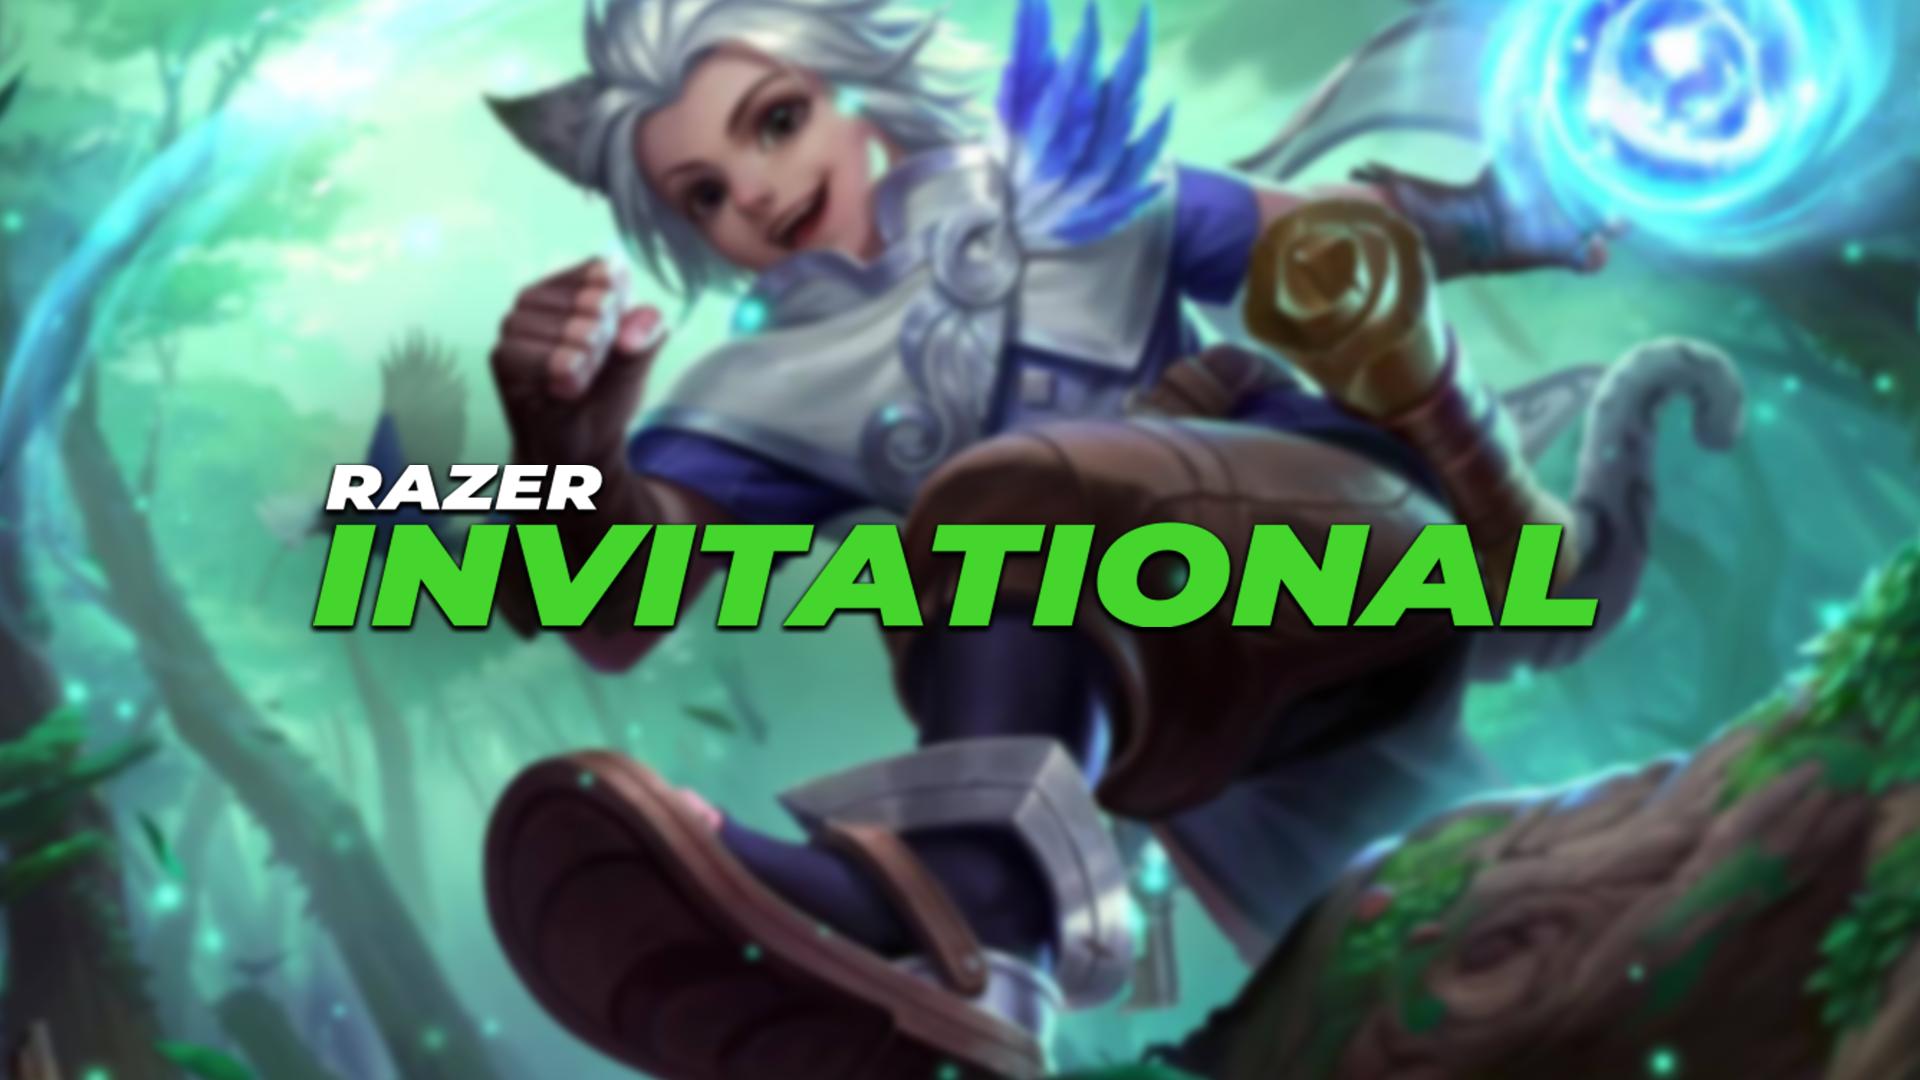 Mobile Legends Razer Invitational